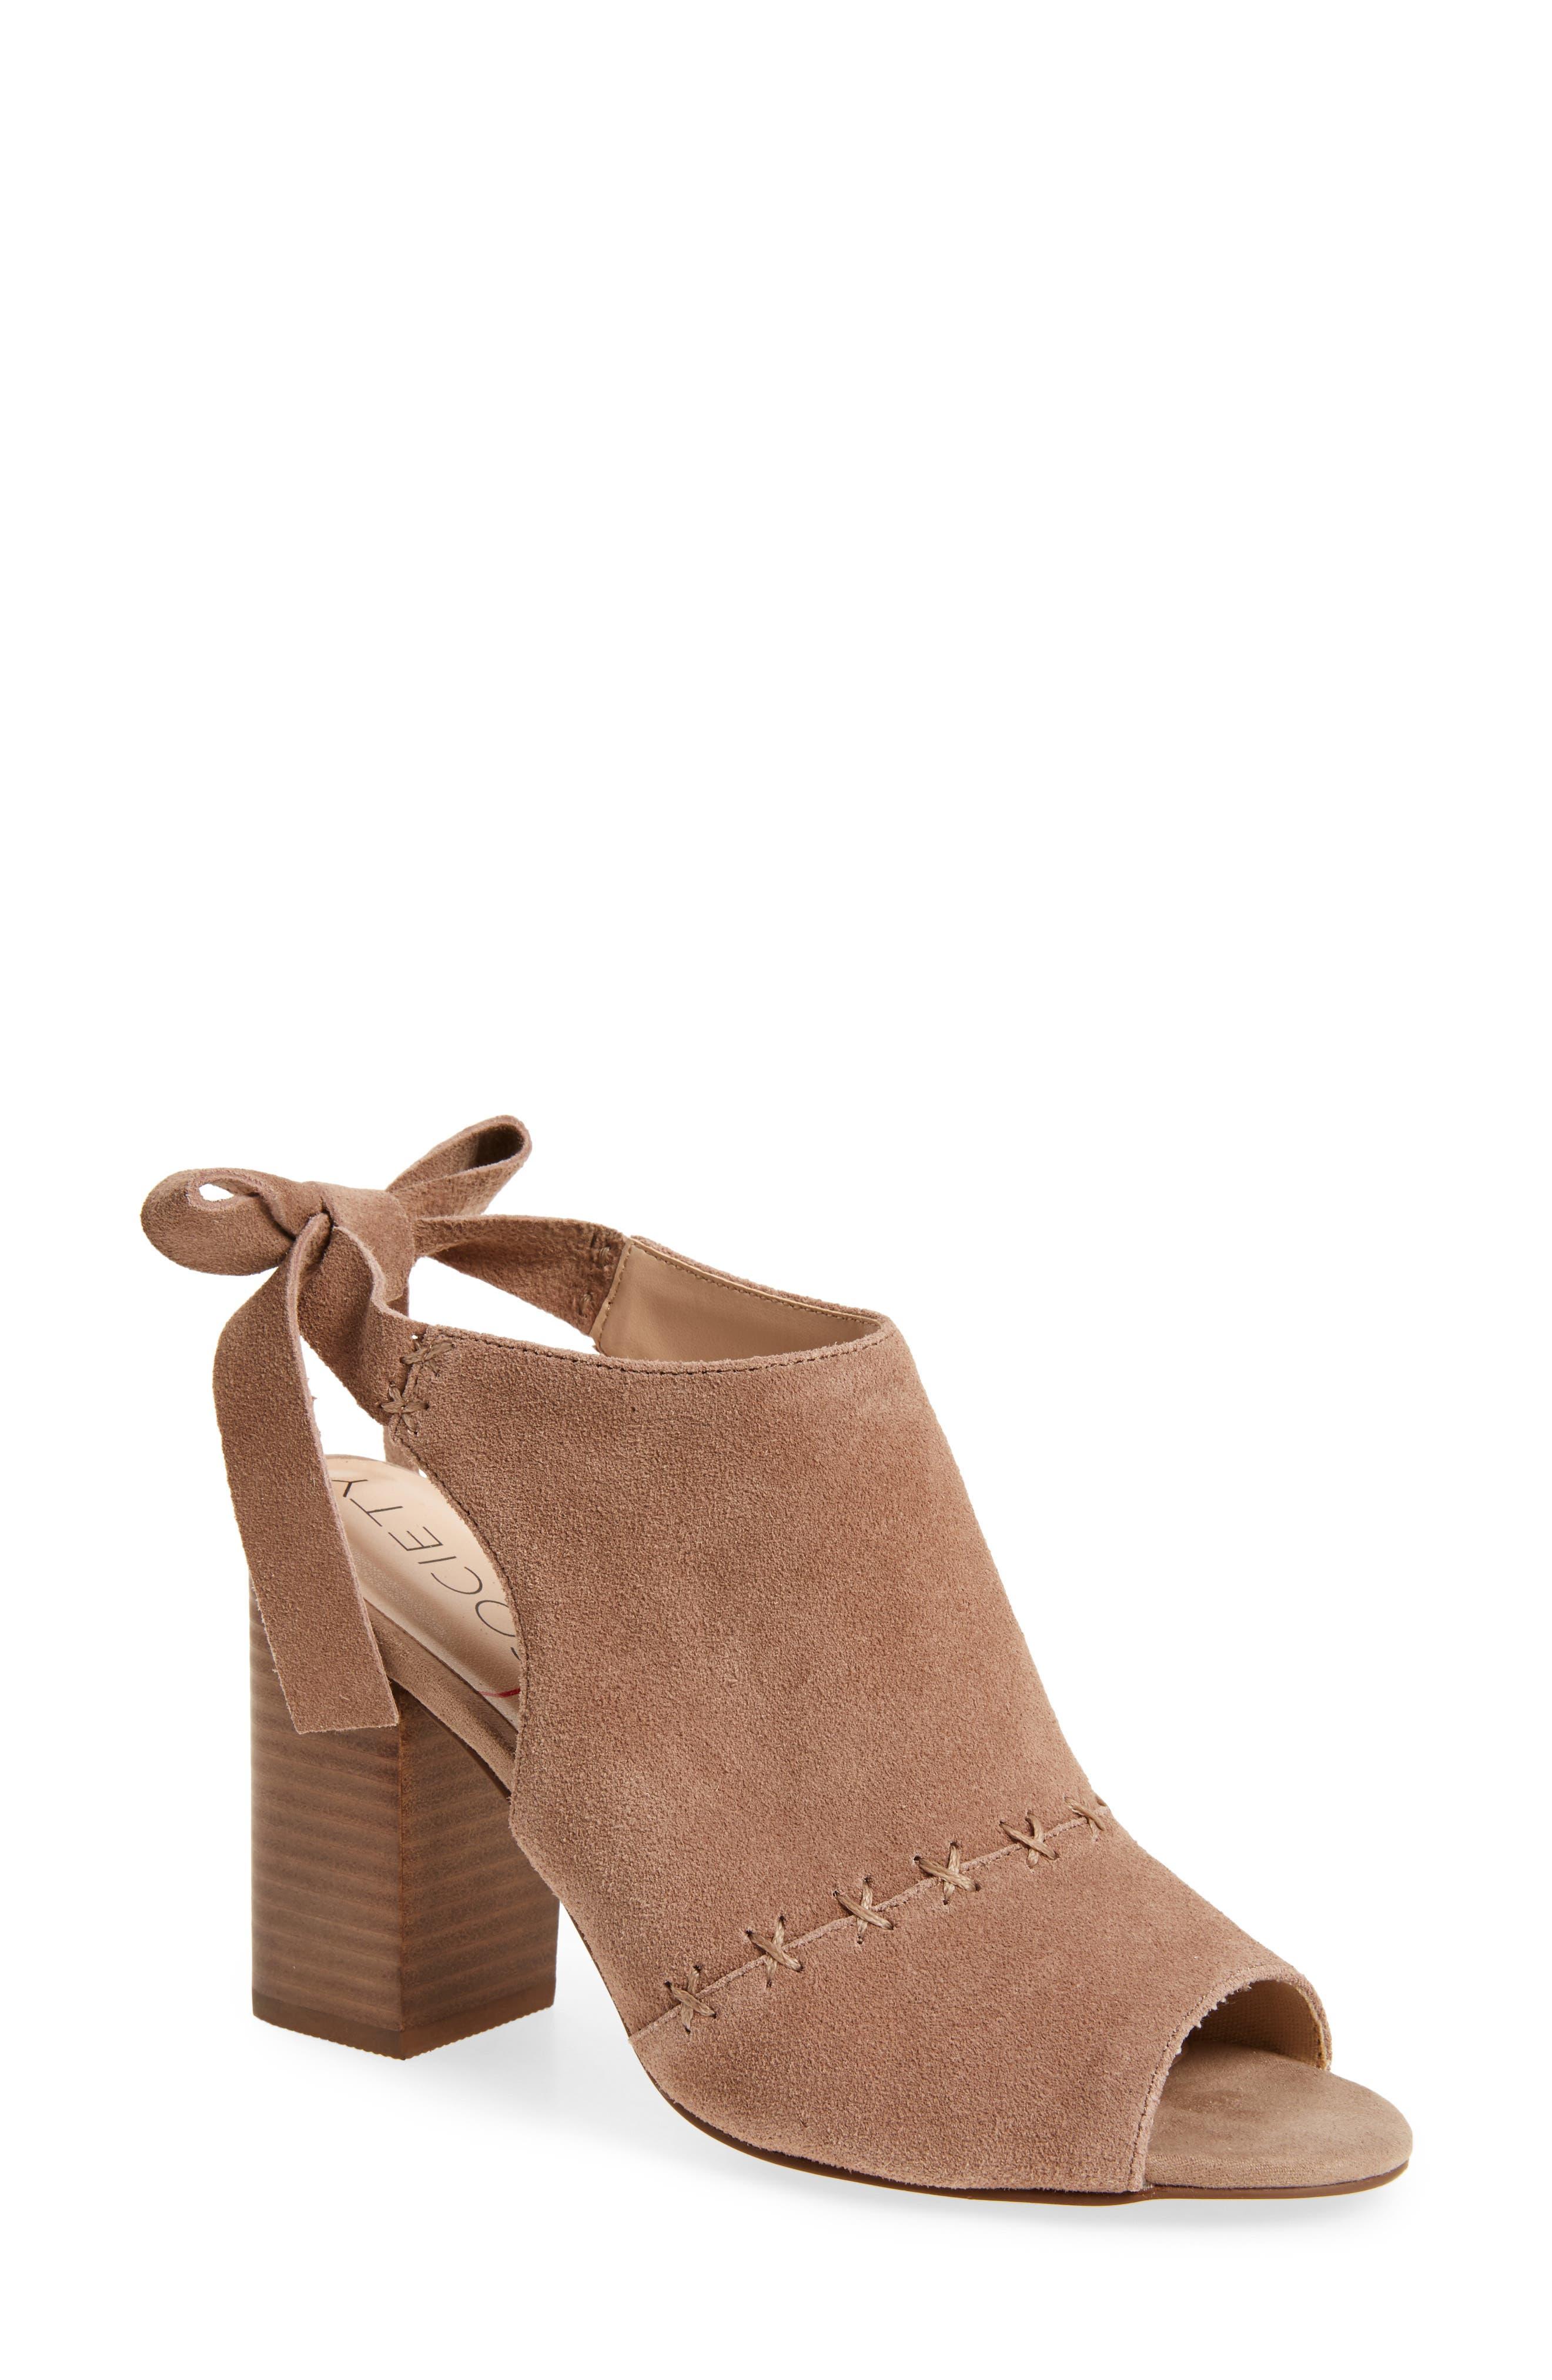 Main Image - Sole Society Albany Slingback Sandal (Women)